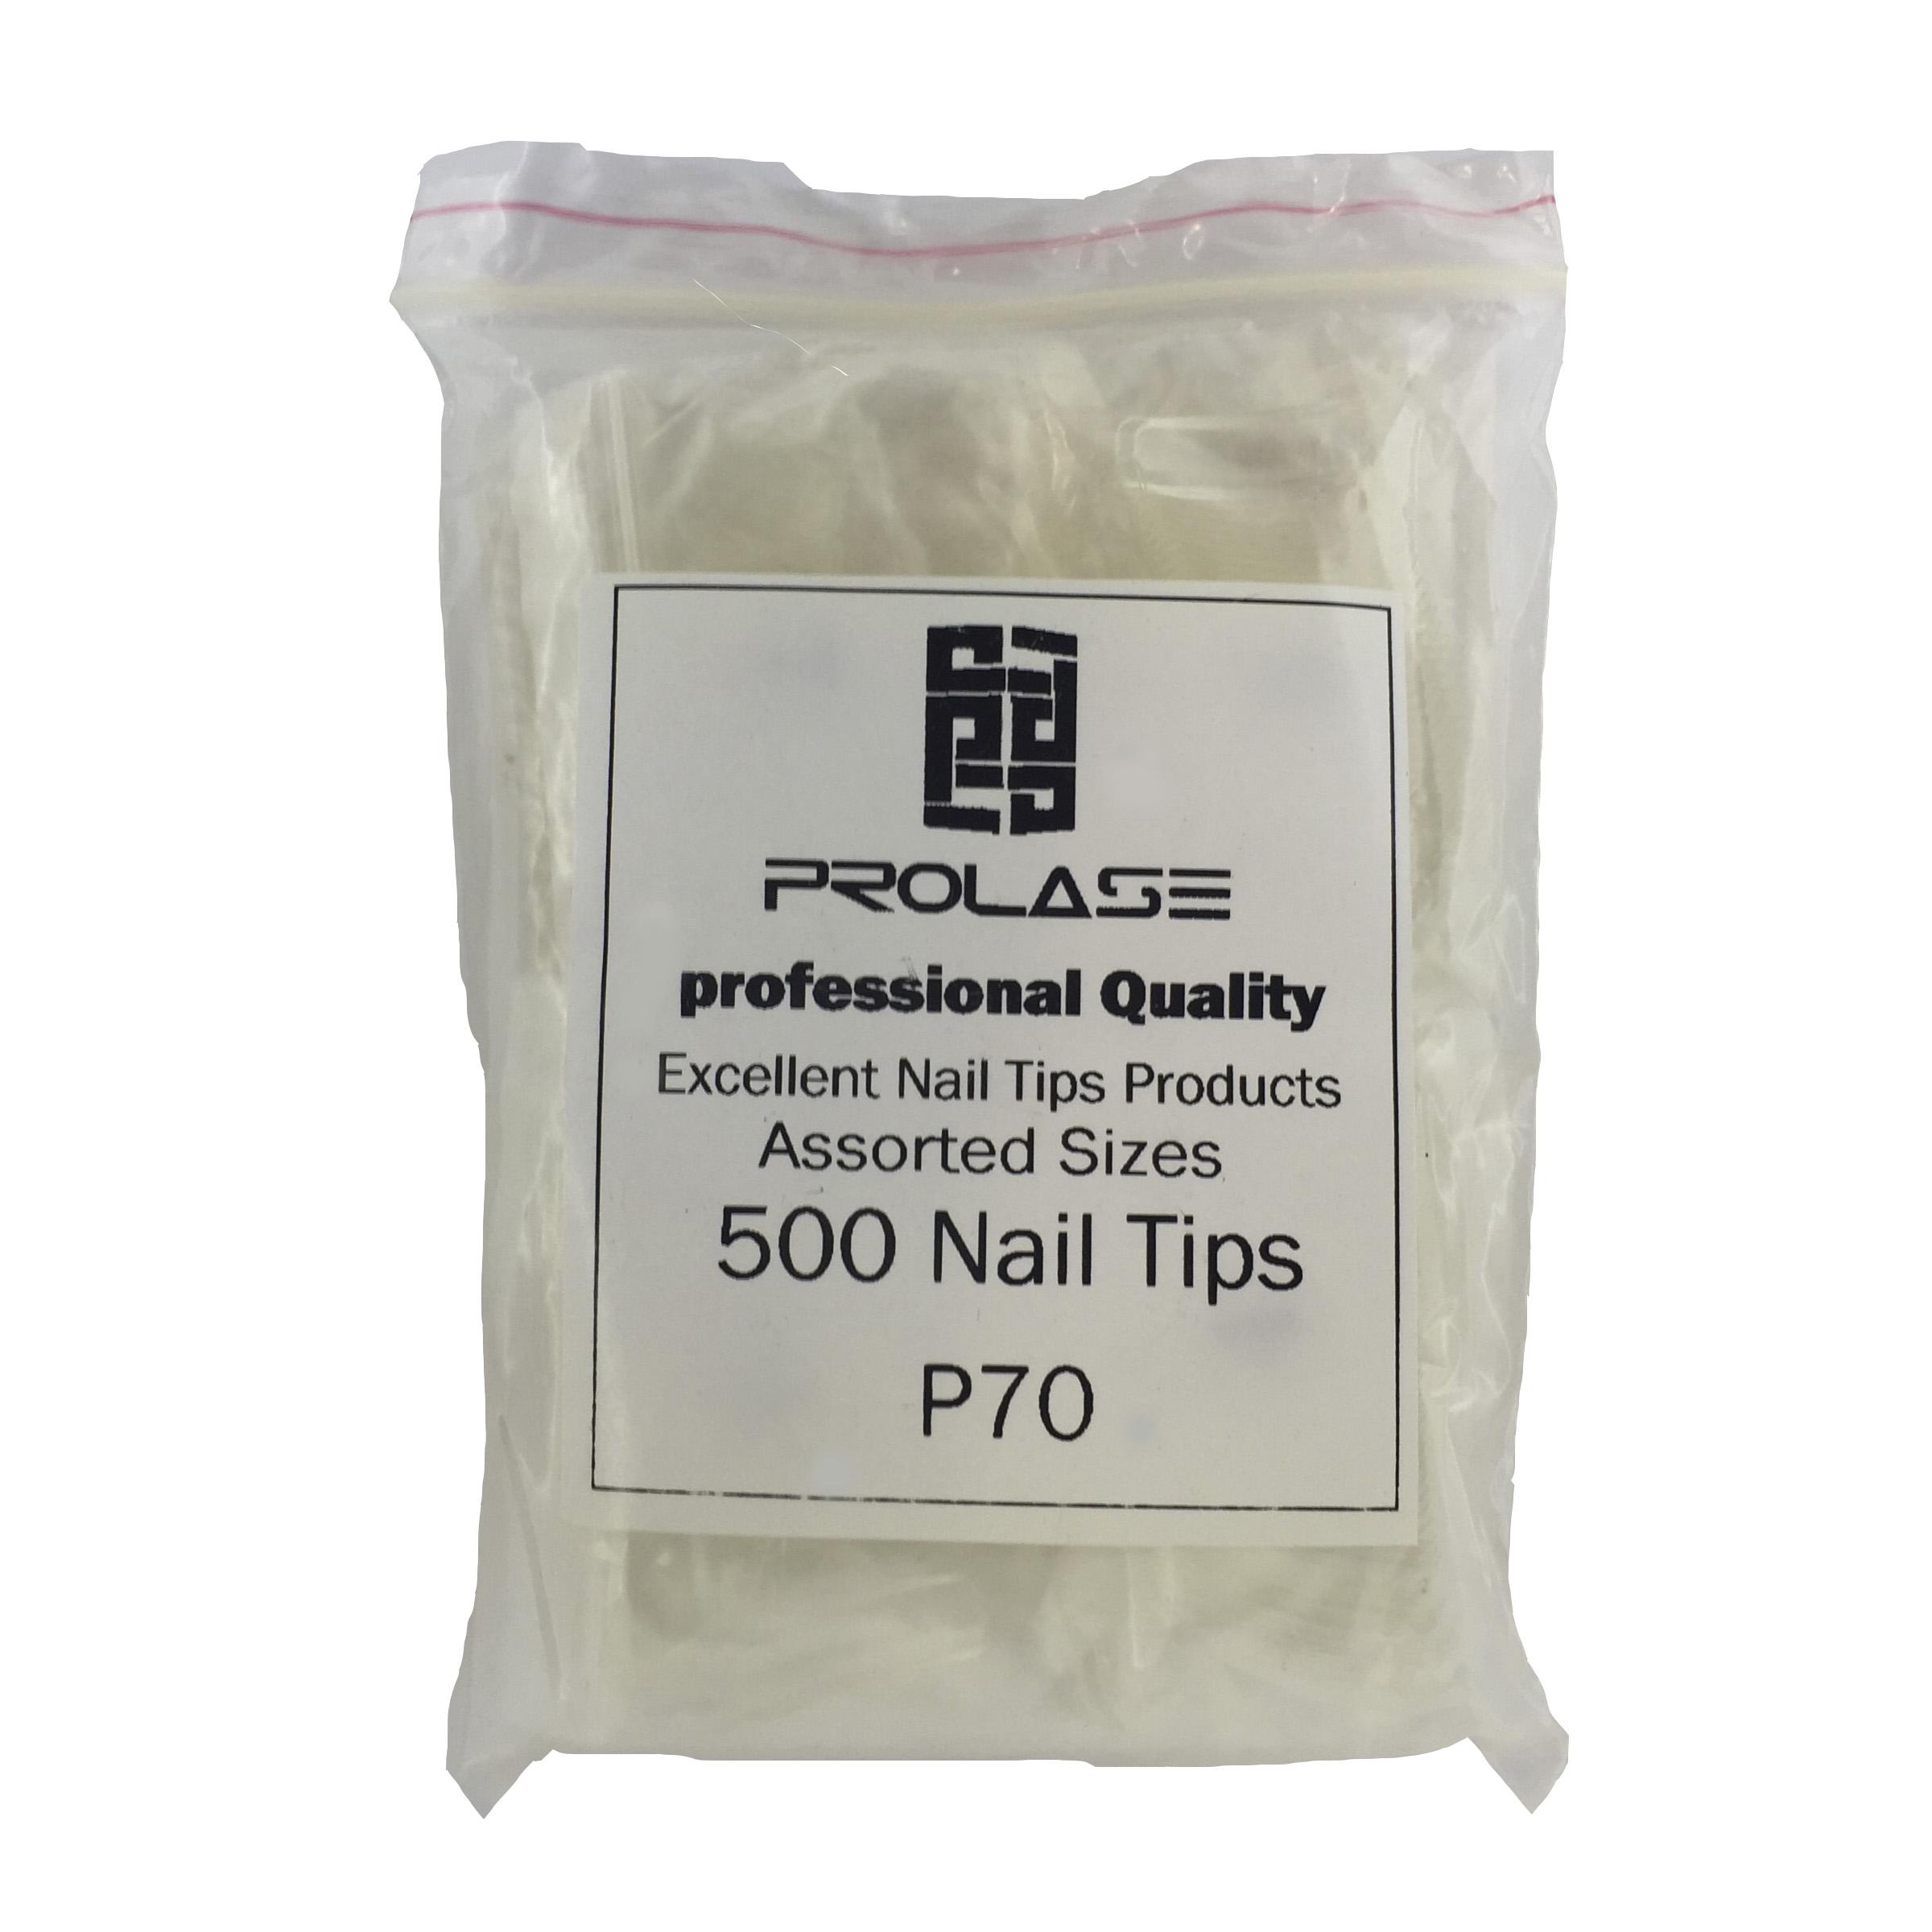 تیپ کاشت ناخن پرولایز مدل P70 بسته 500 عددی